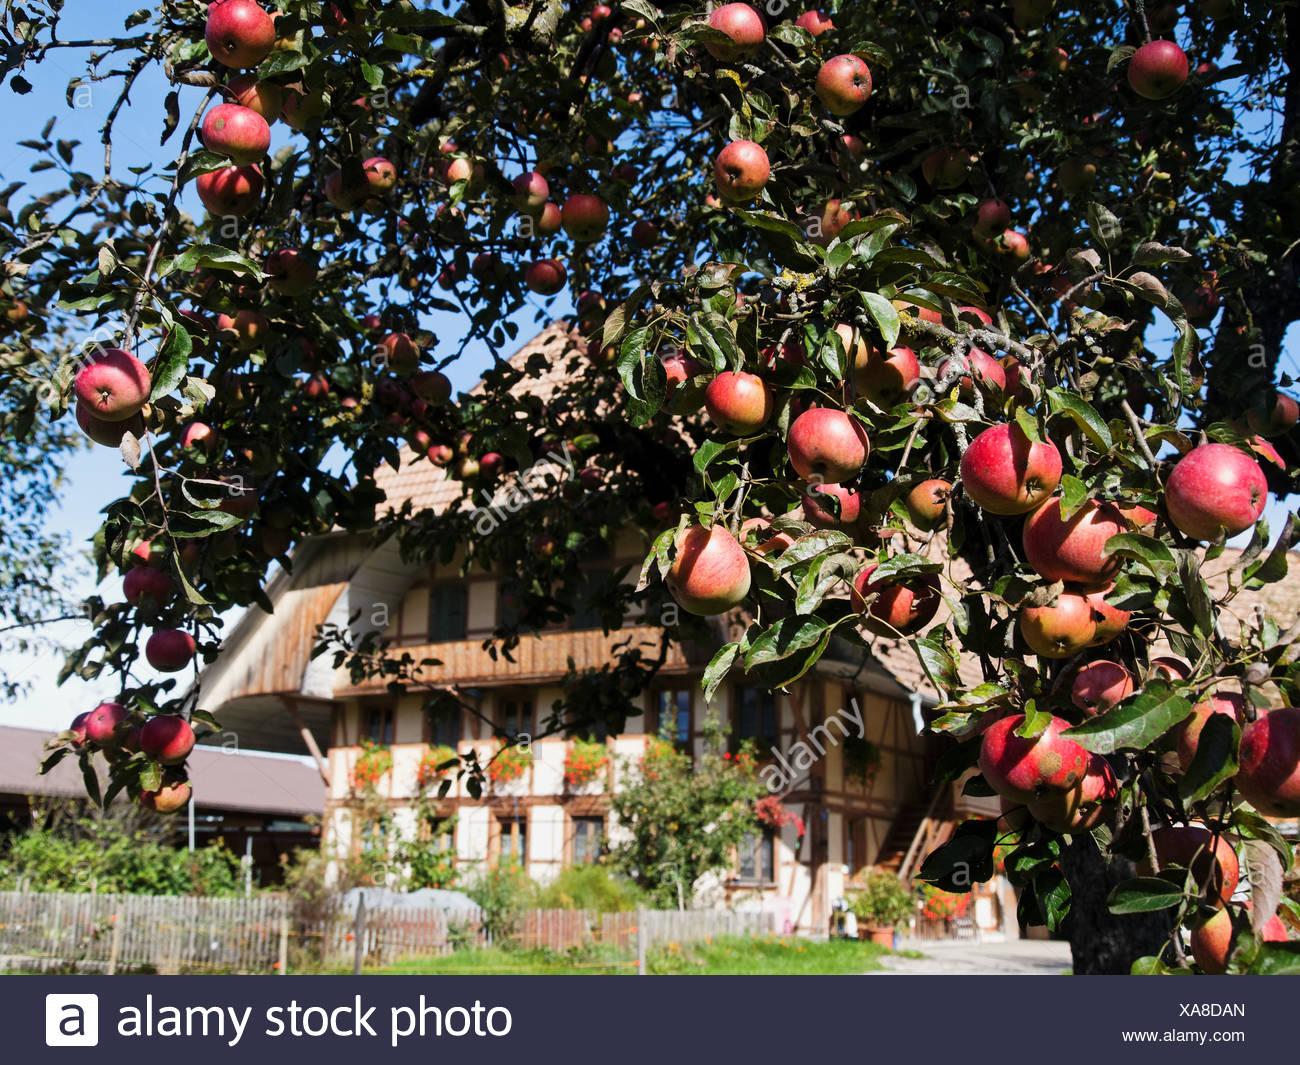 Apple, Apple tree, granja, árbol, cortijo, Emmental, cantón de Berna, Berna, frutas, huerto, Rüderswil, Suiza, Europa Foto de stock